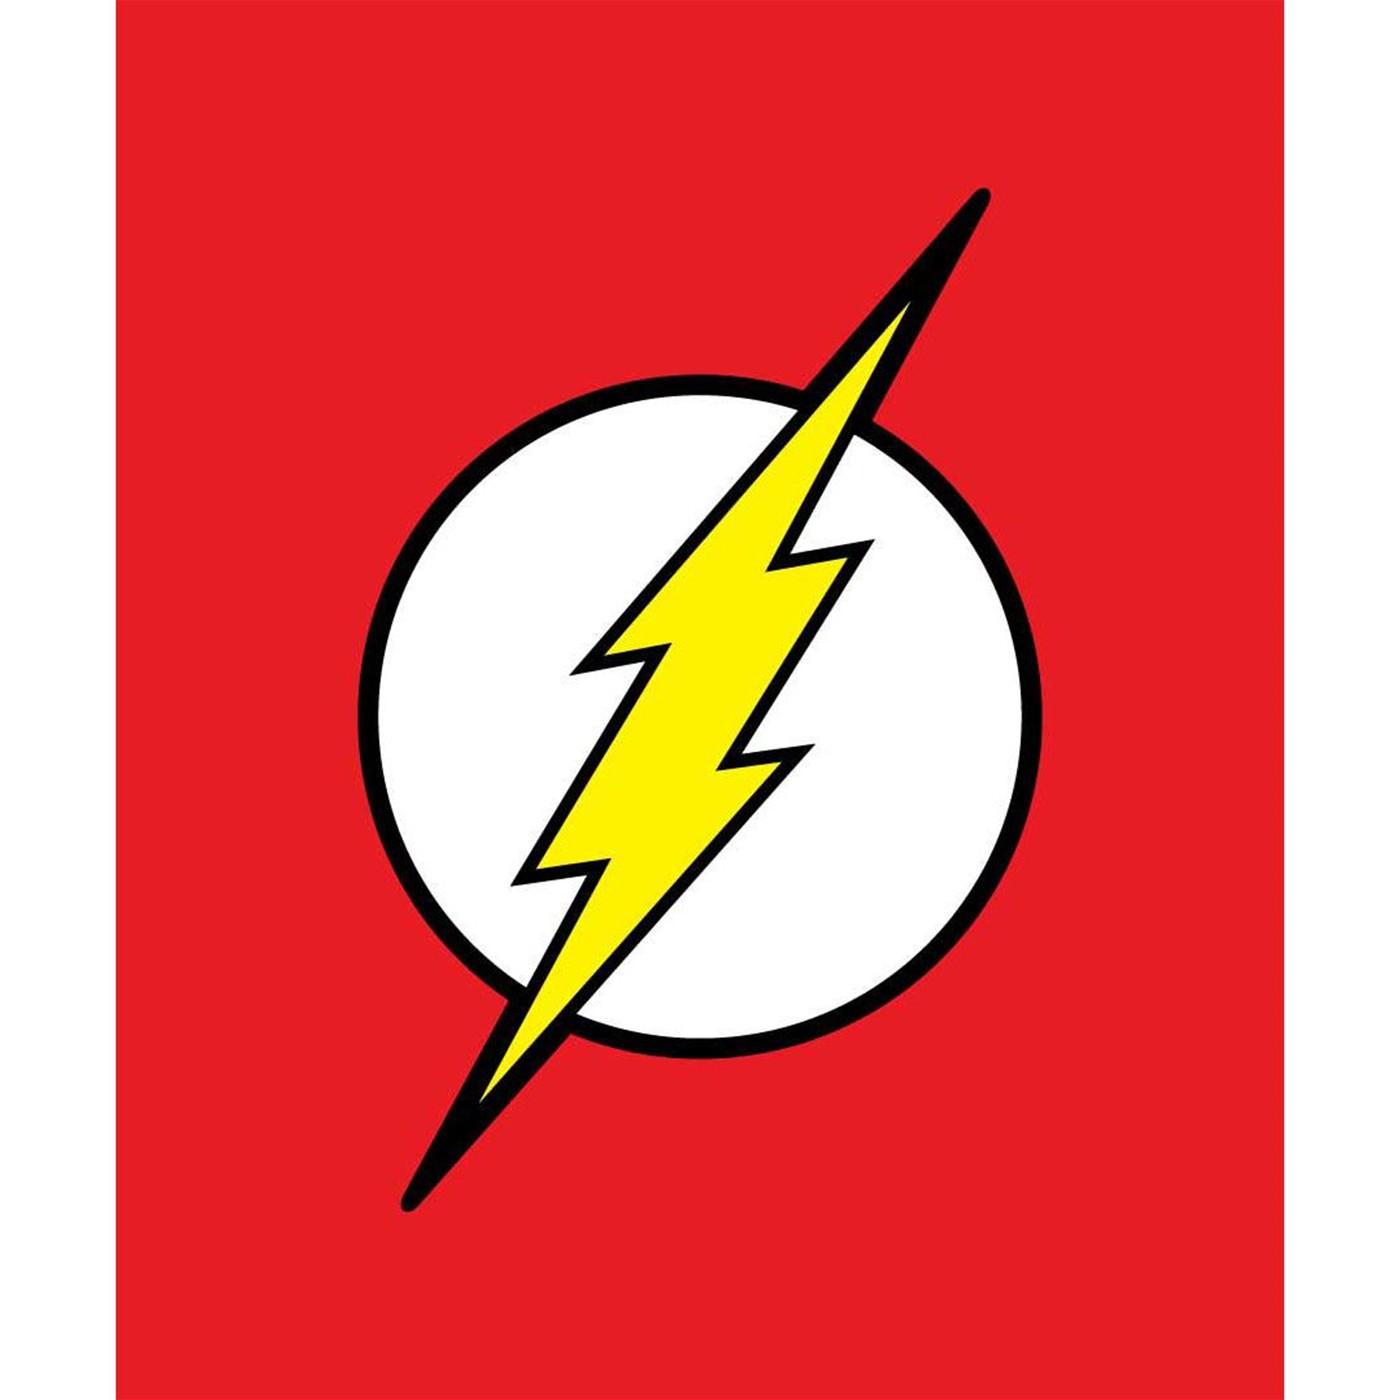 The Flash Symbol Queen Blanket Dc the flash illustration, chibi, flash, the flash, dc comics. jpi